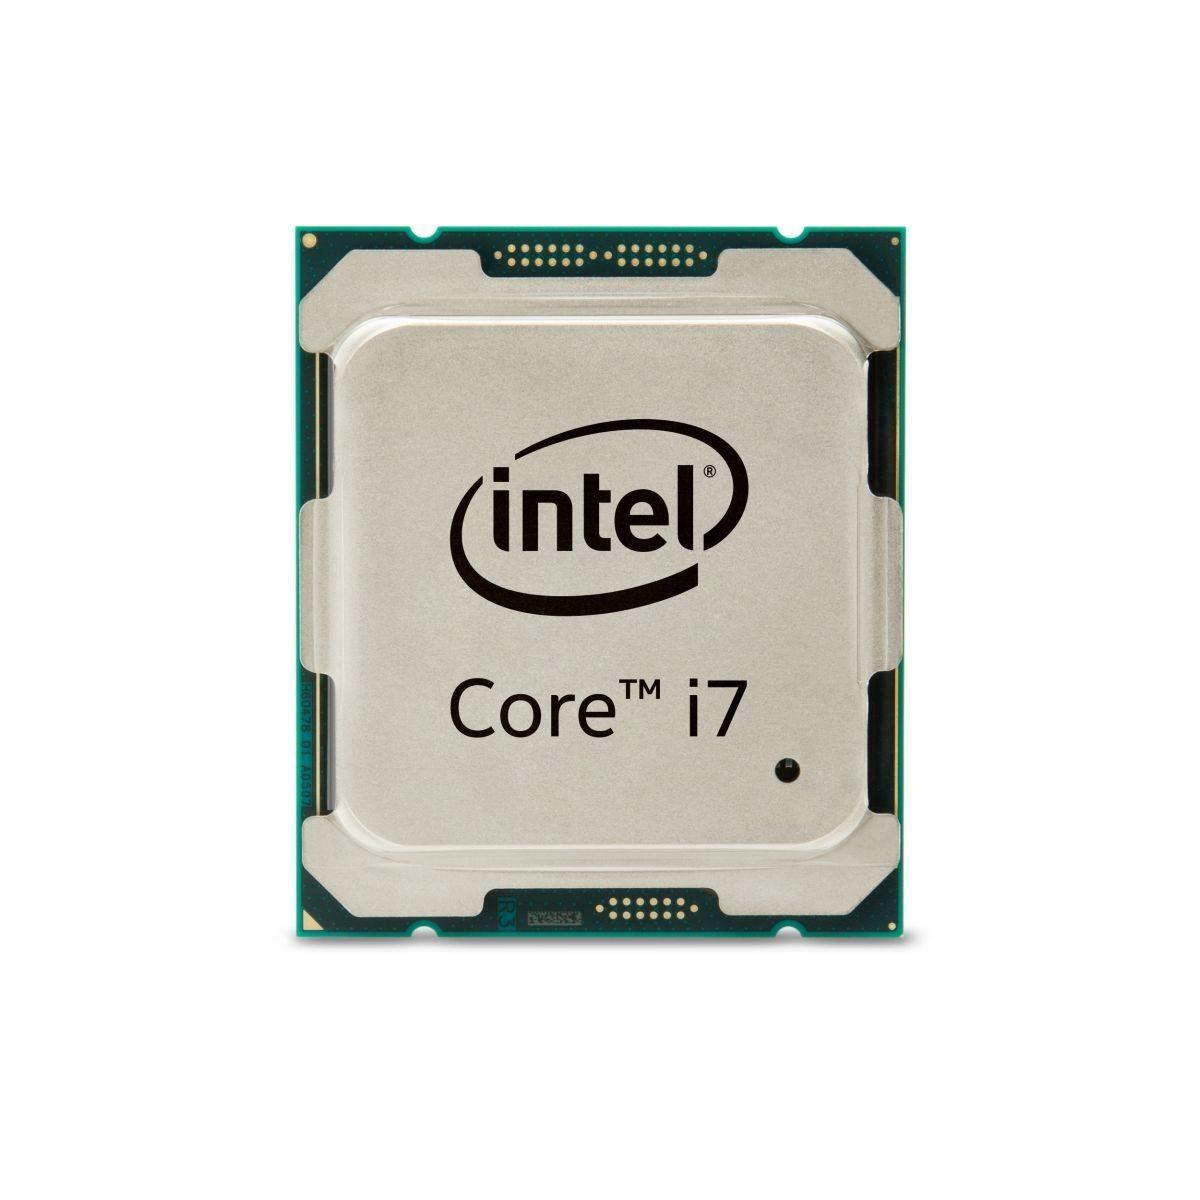 Intel Core i7 Extreme Edition Broadwell-E hero